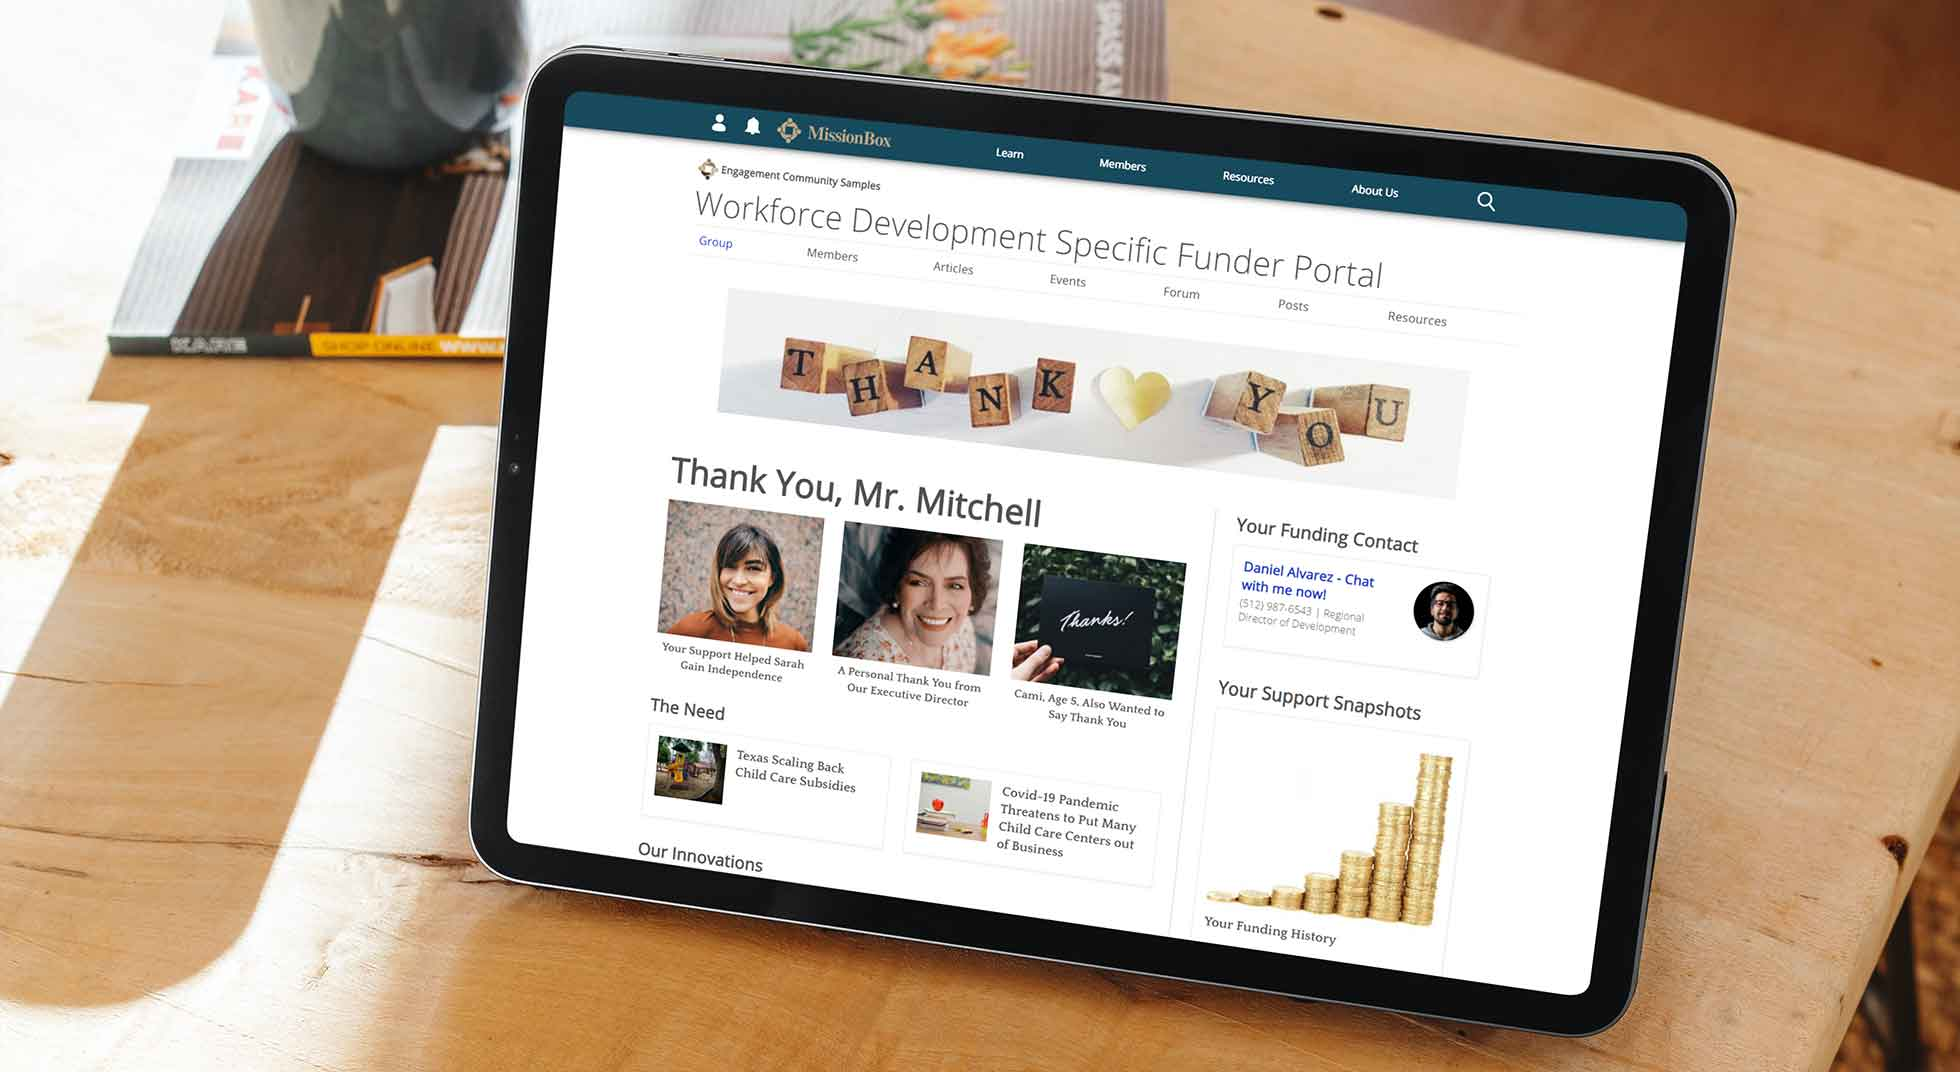 Specific Funder Portal